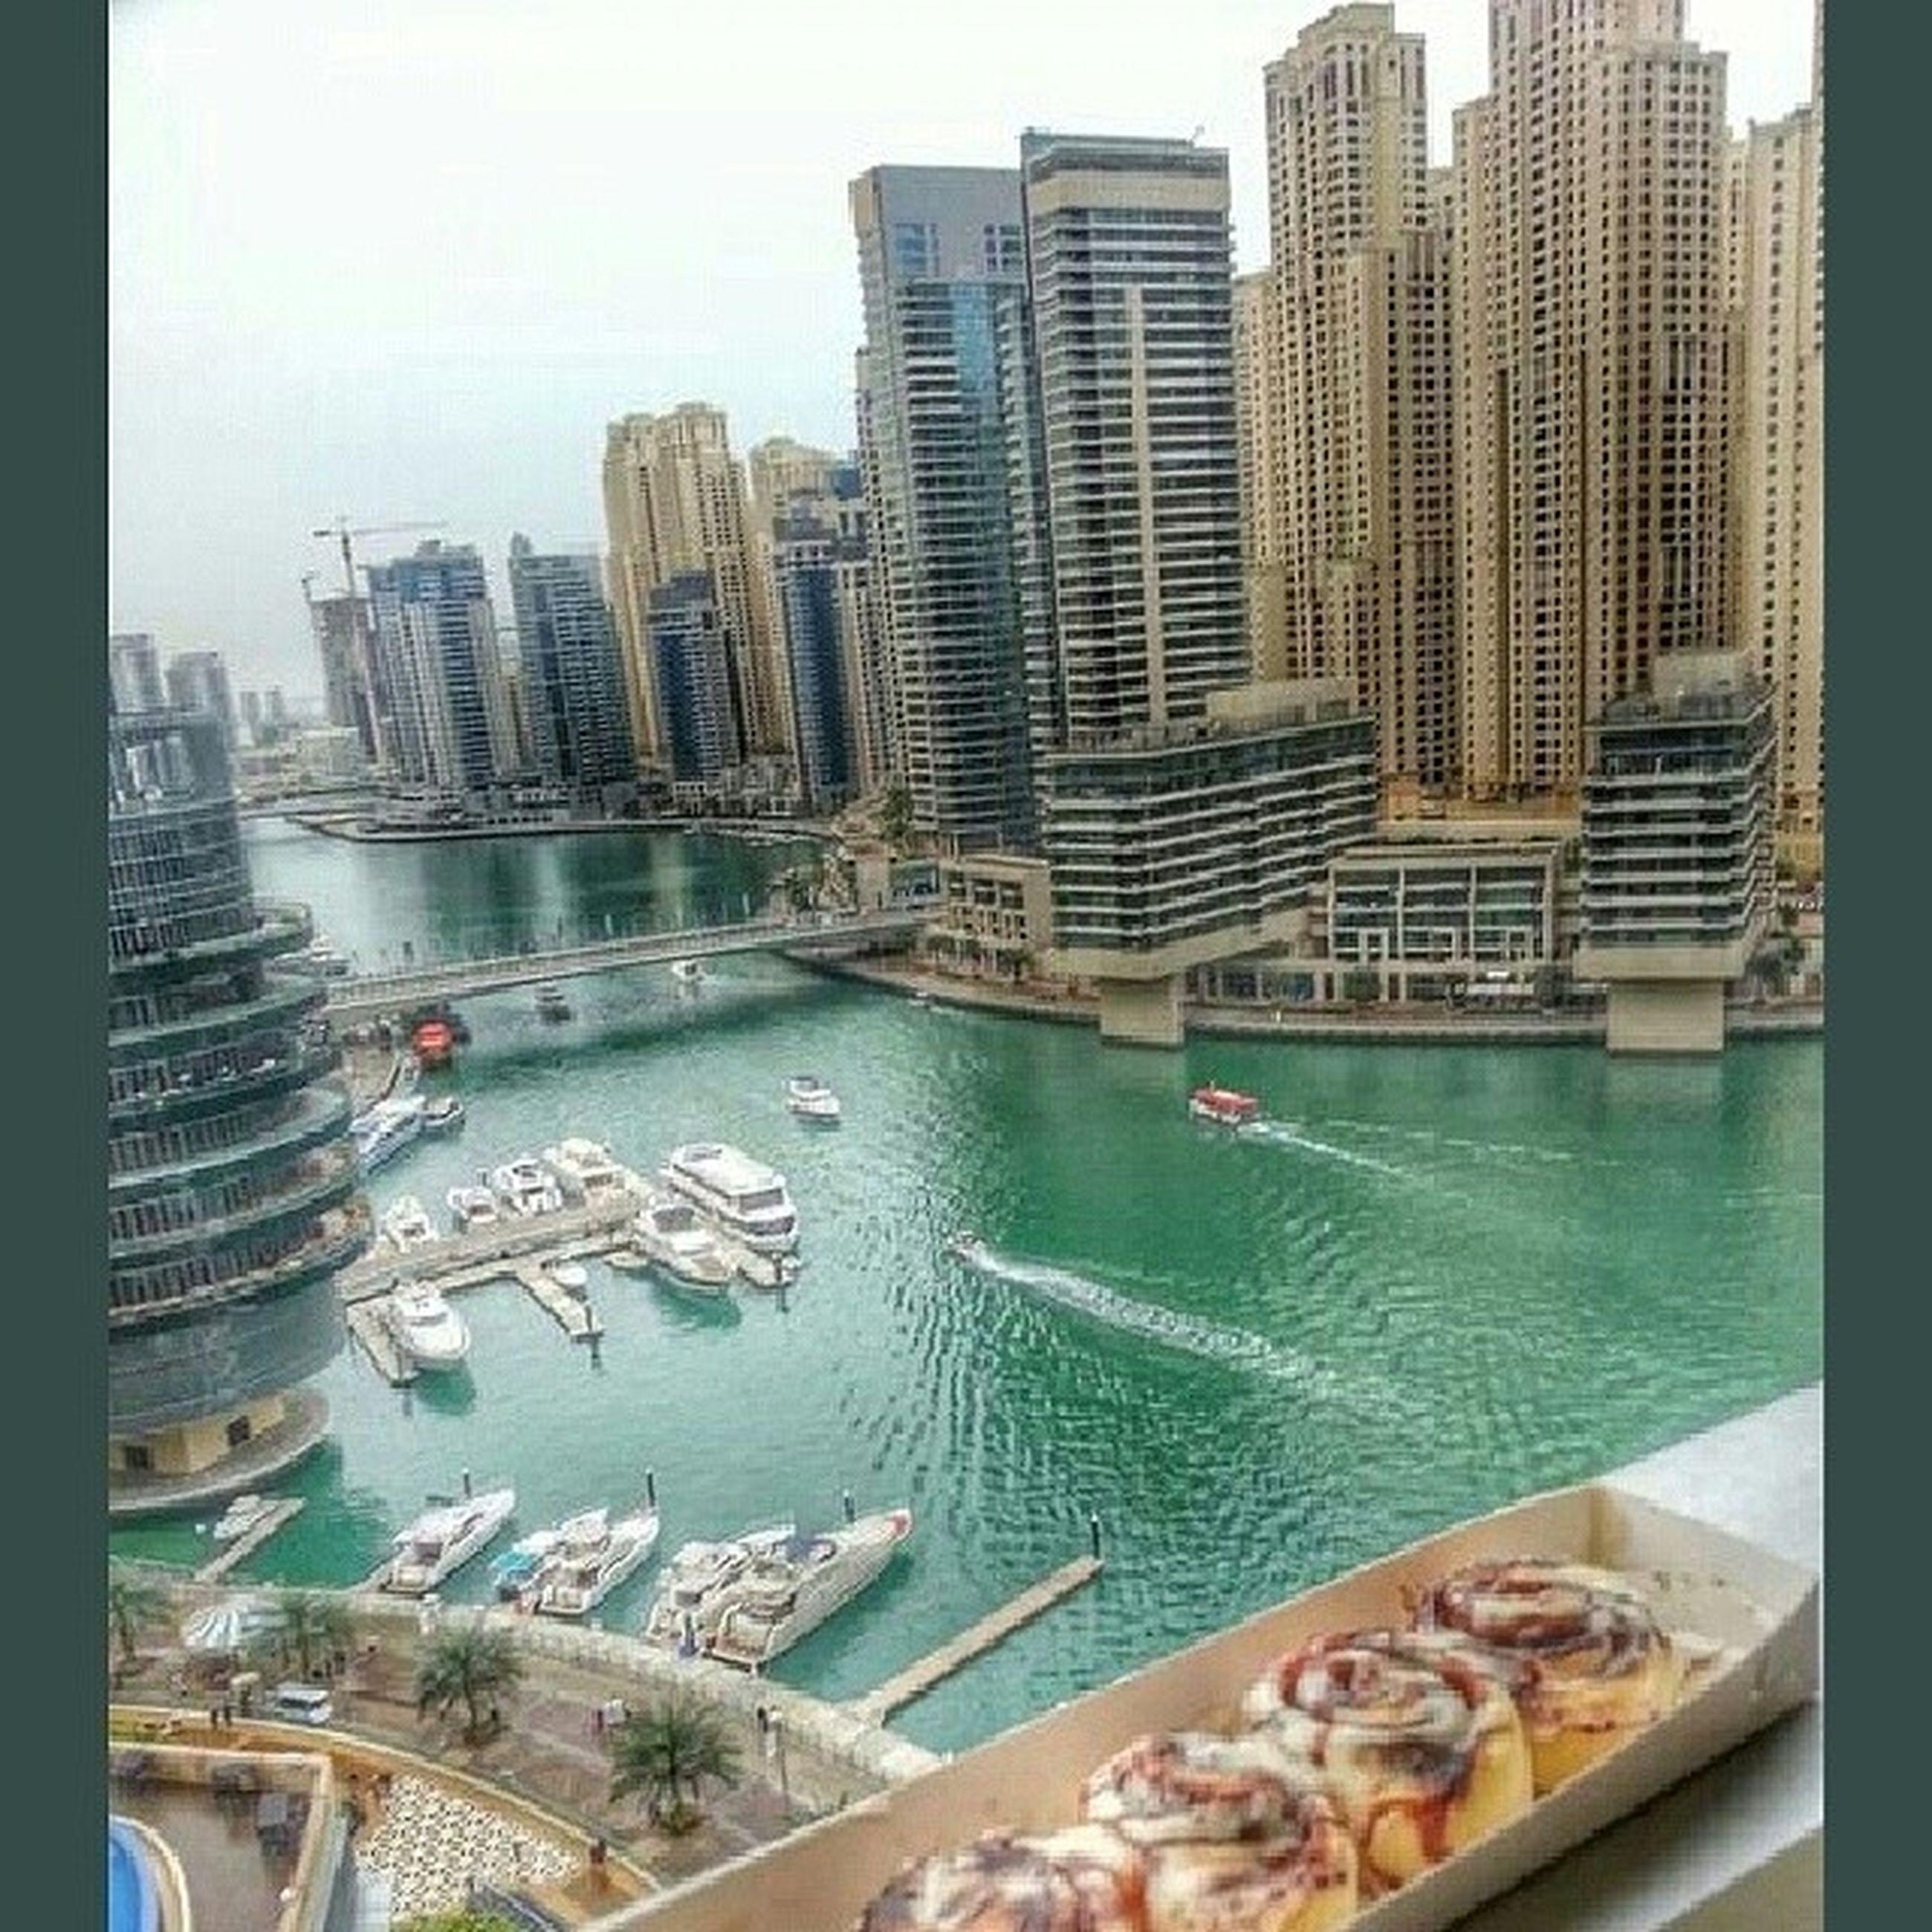 Travel Agencies For Sale In Dubai